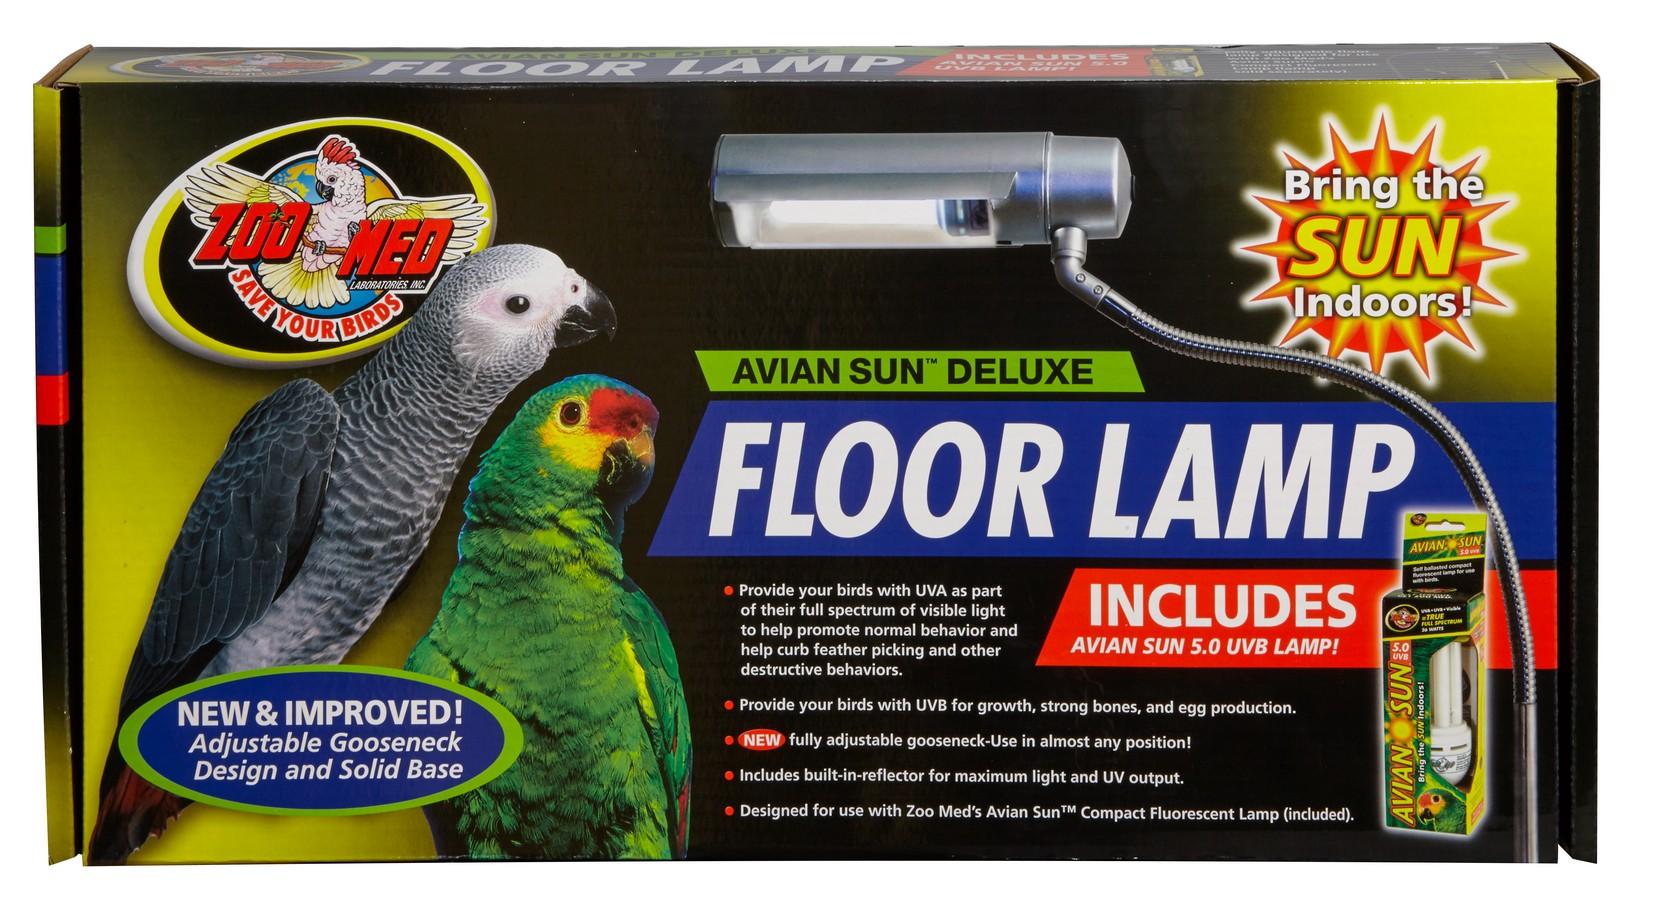 Avian Sun Deluxe Floor Lamp with Avian Sun 5.0 UVB Lamp